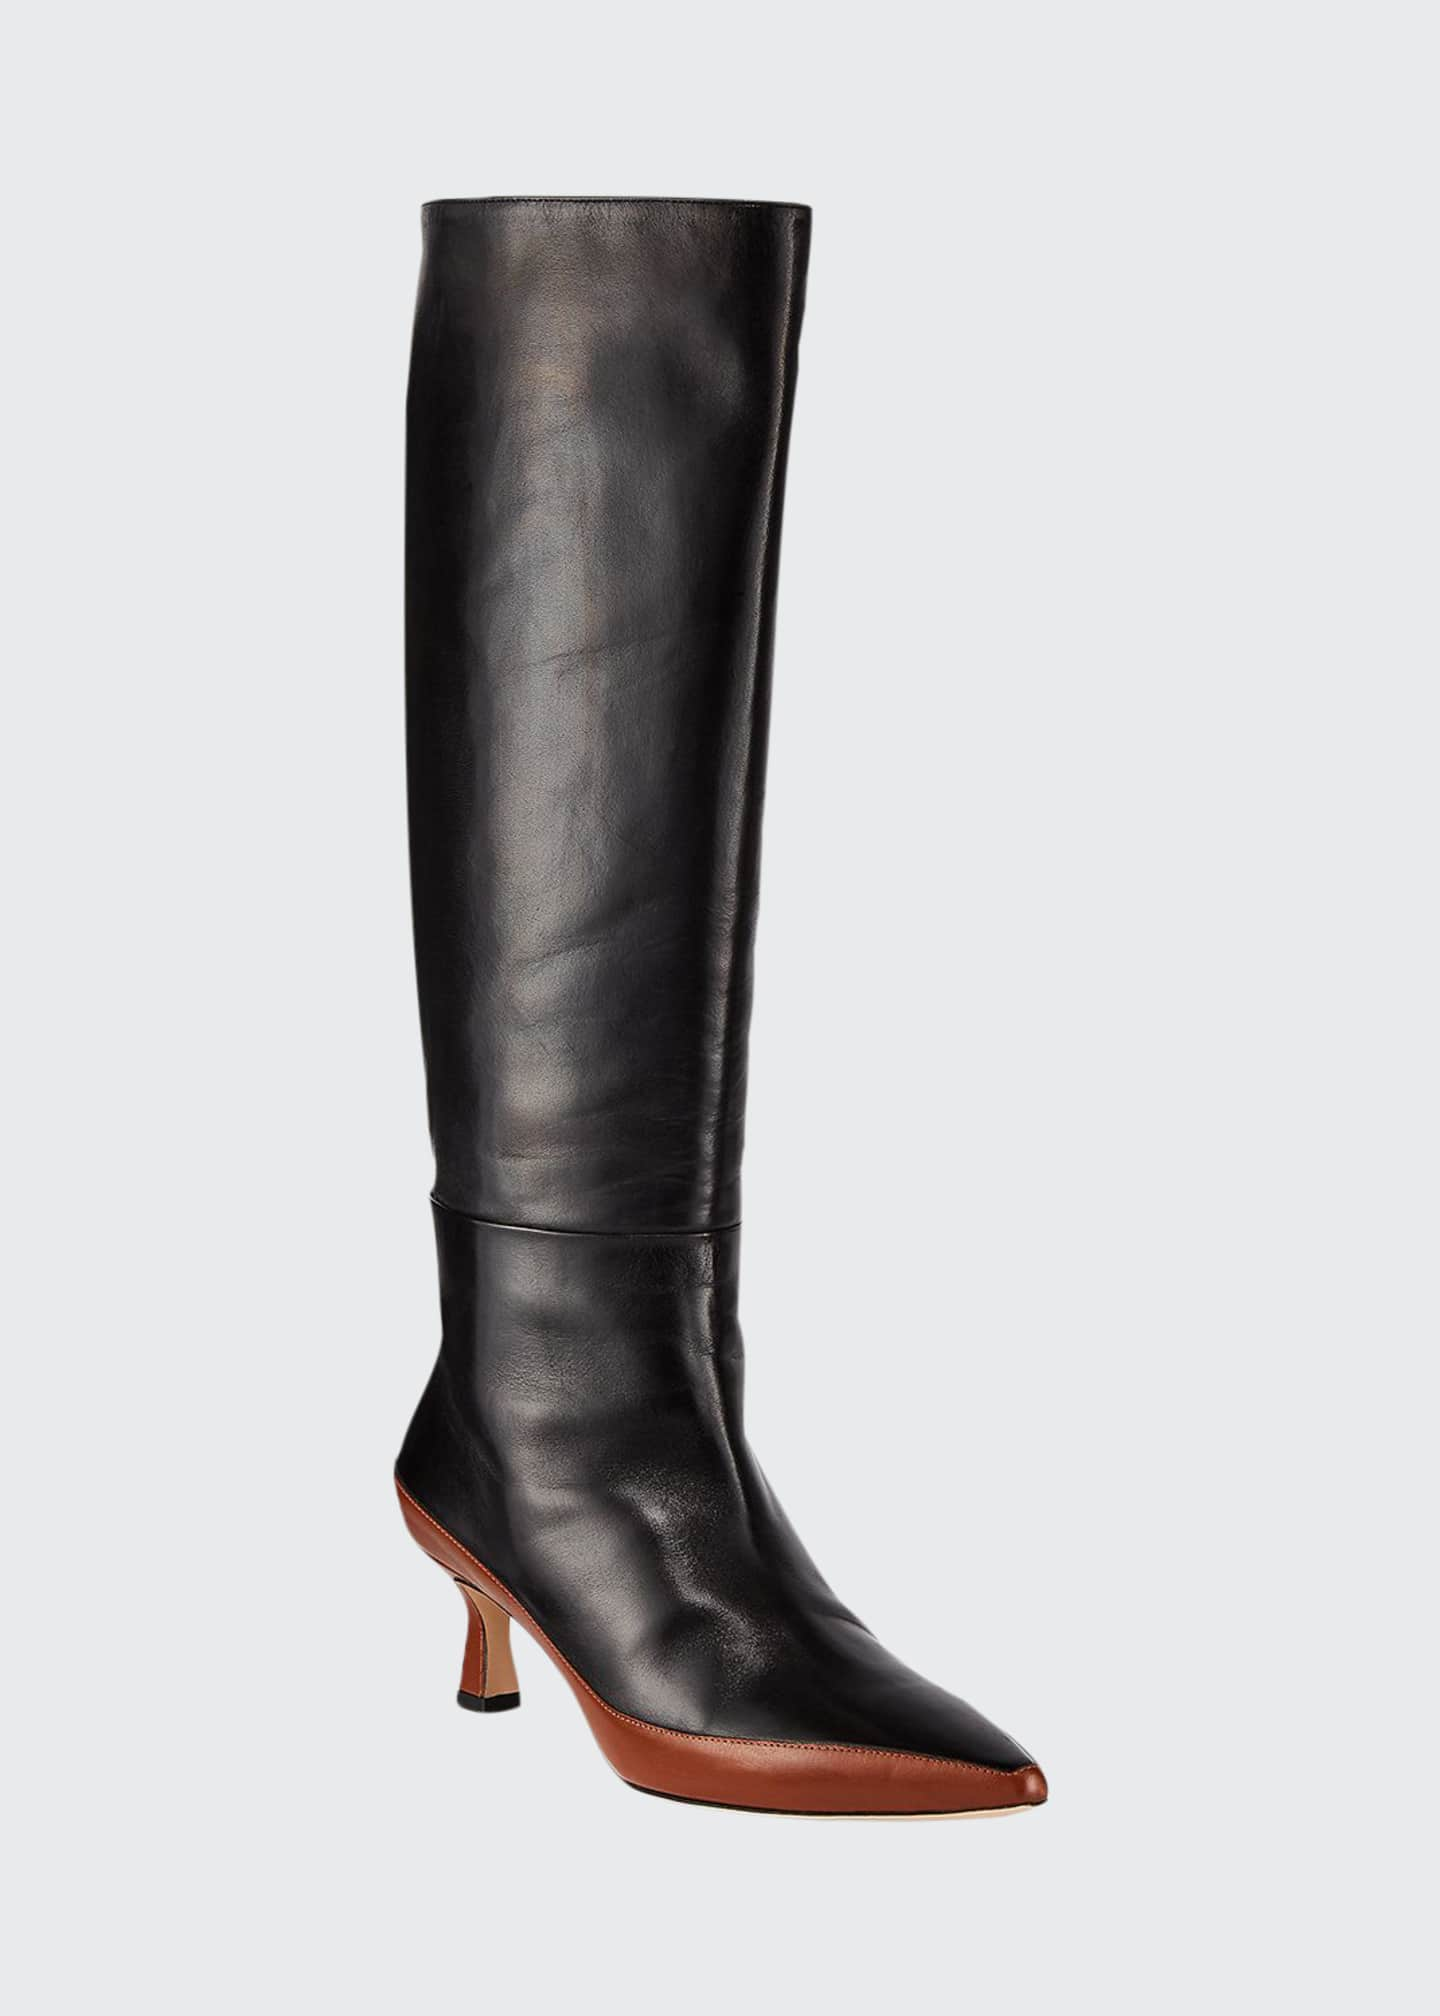 Wandler Bente Two-Tone Knee Boots